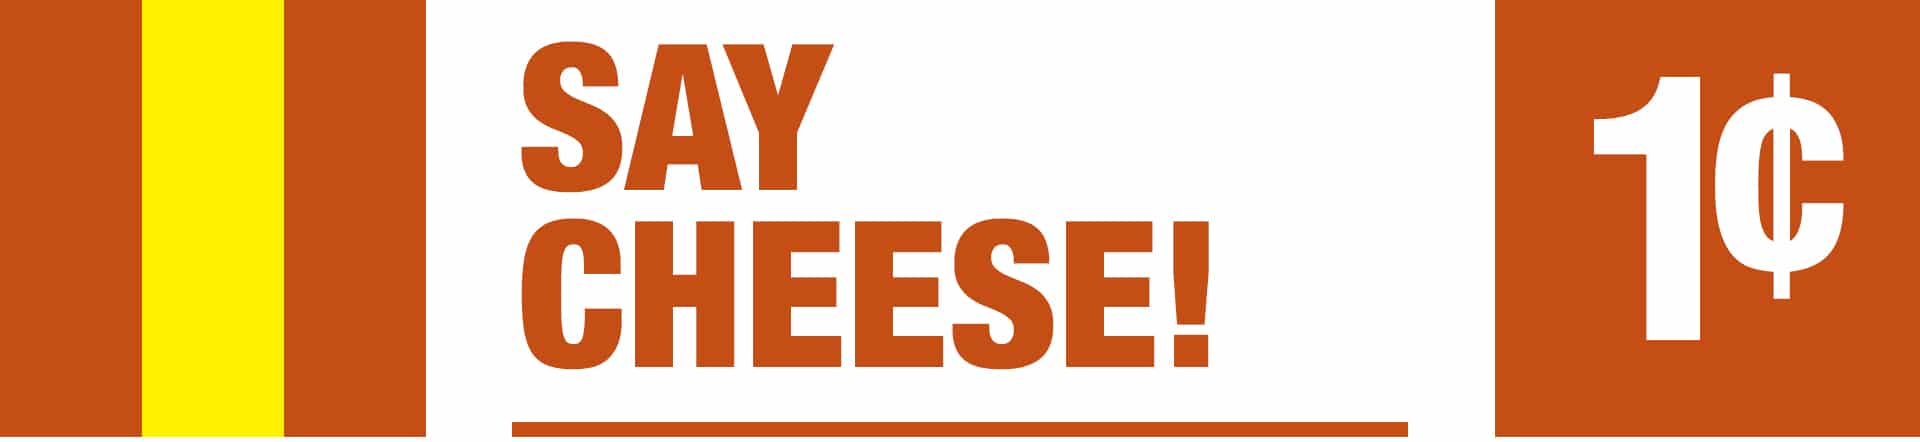 Say Cheese! - Penny Jackpot